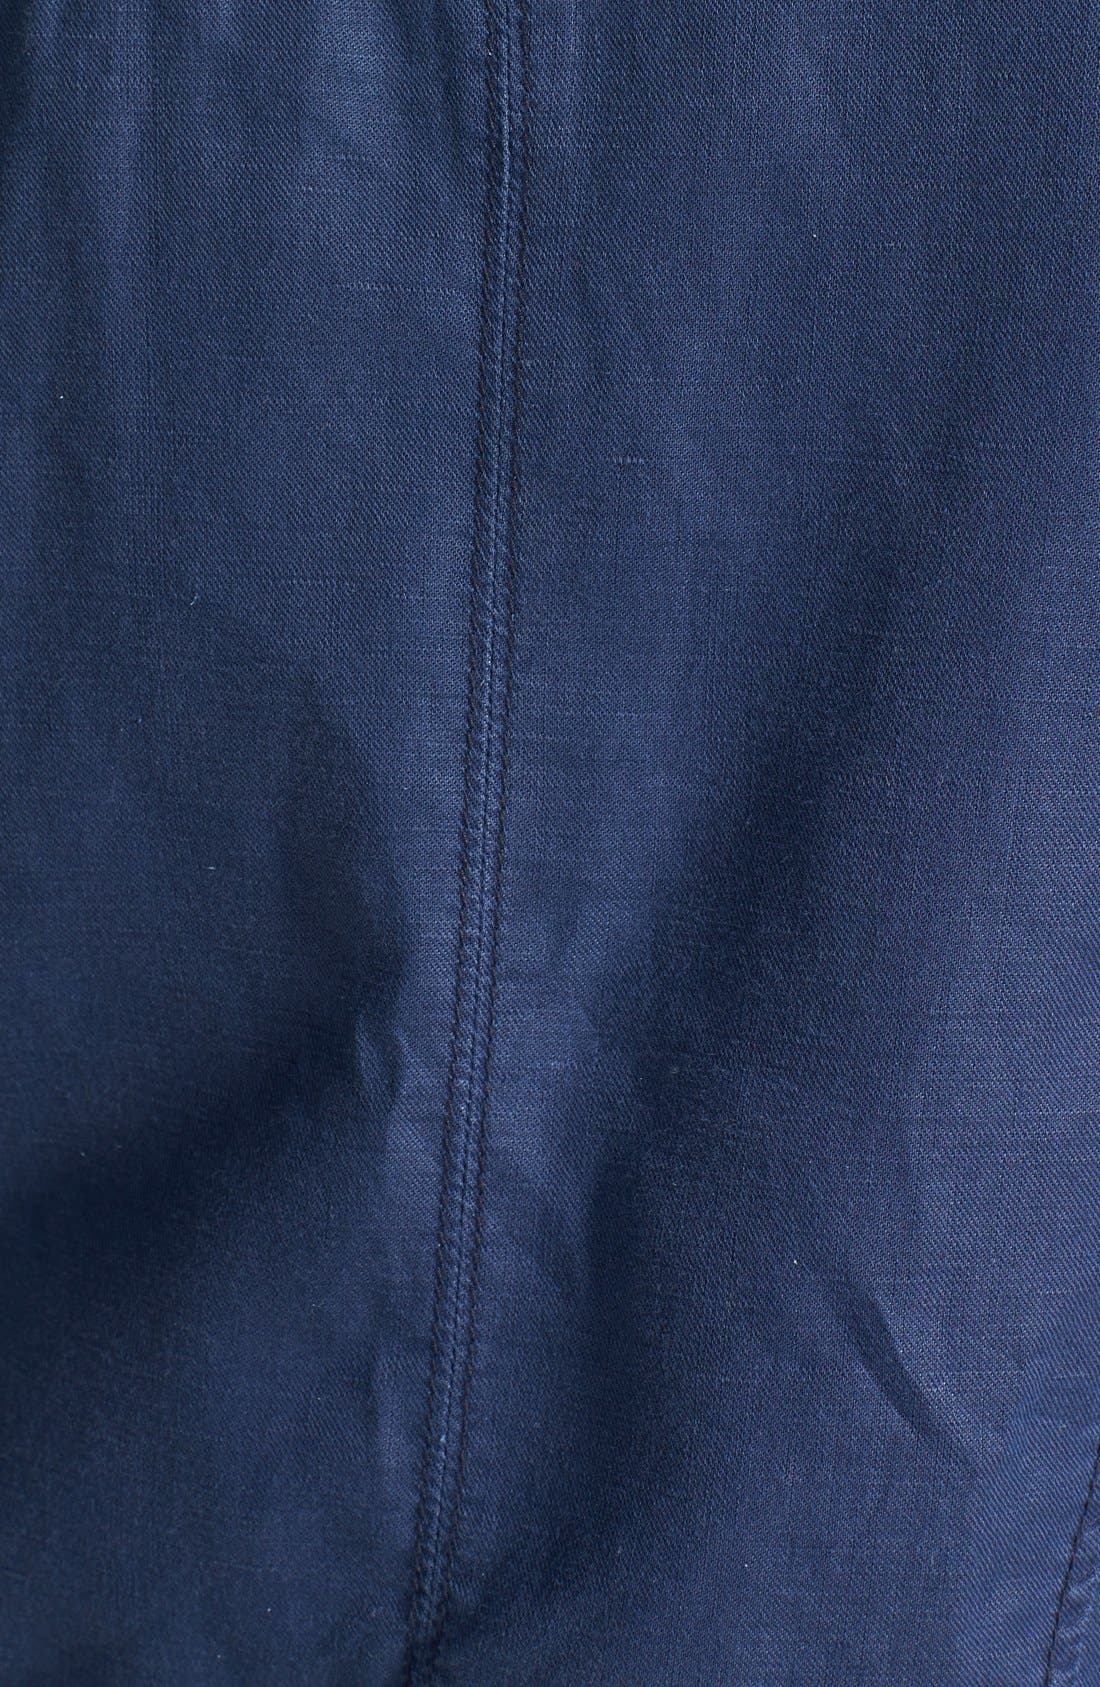 Faux Leather & Linen Blend Moto Jacket,                             Alternate thumbnail 3, color,                             Indigo